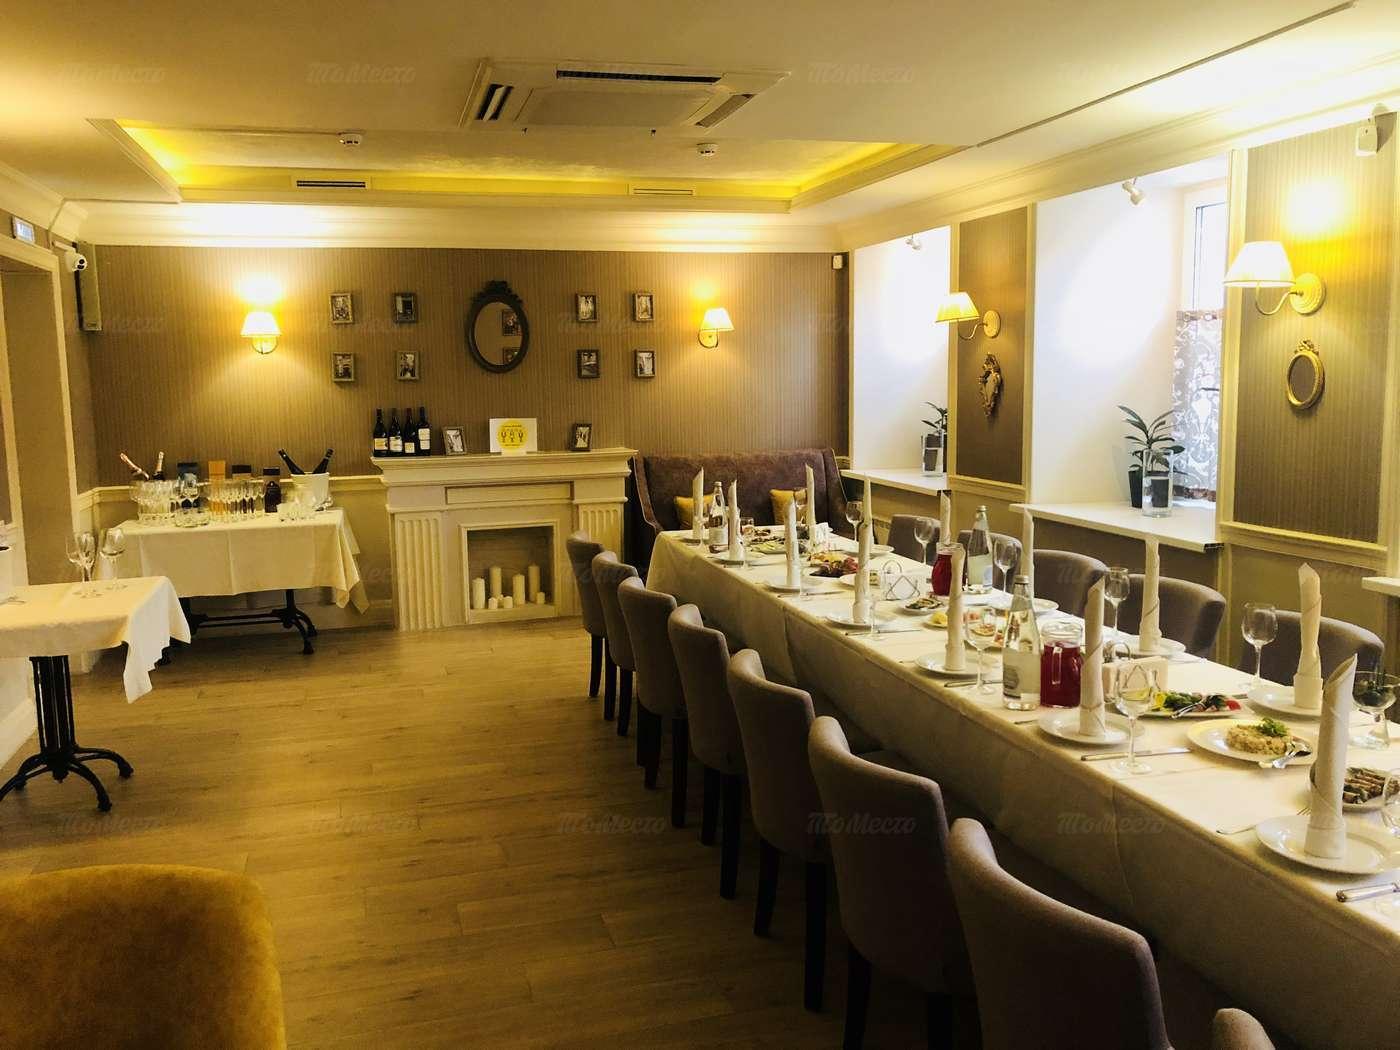 Ресторан Semplice (Траттория Семпличе) на улице Чаплыгина фото 20